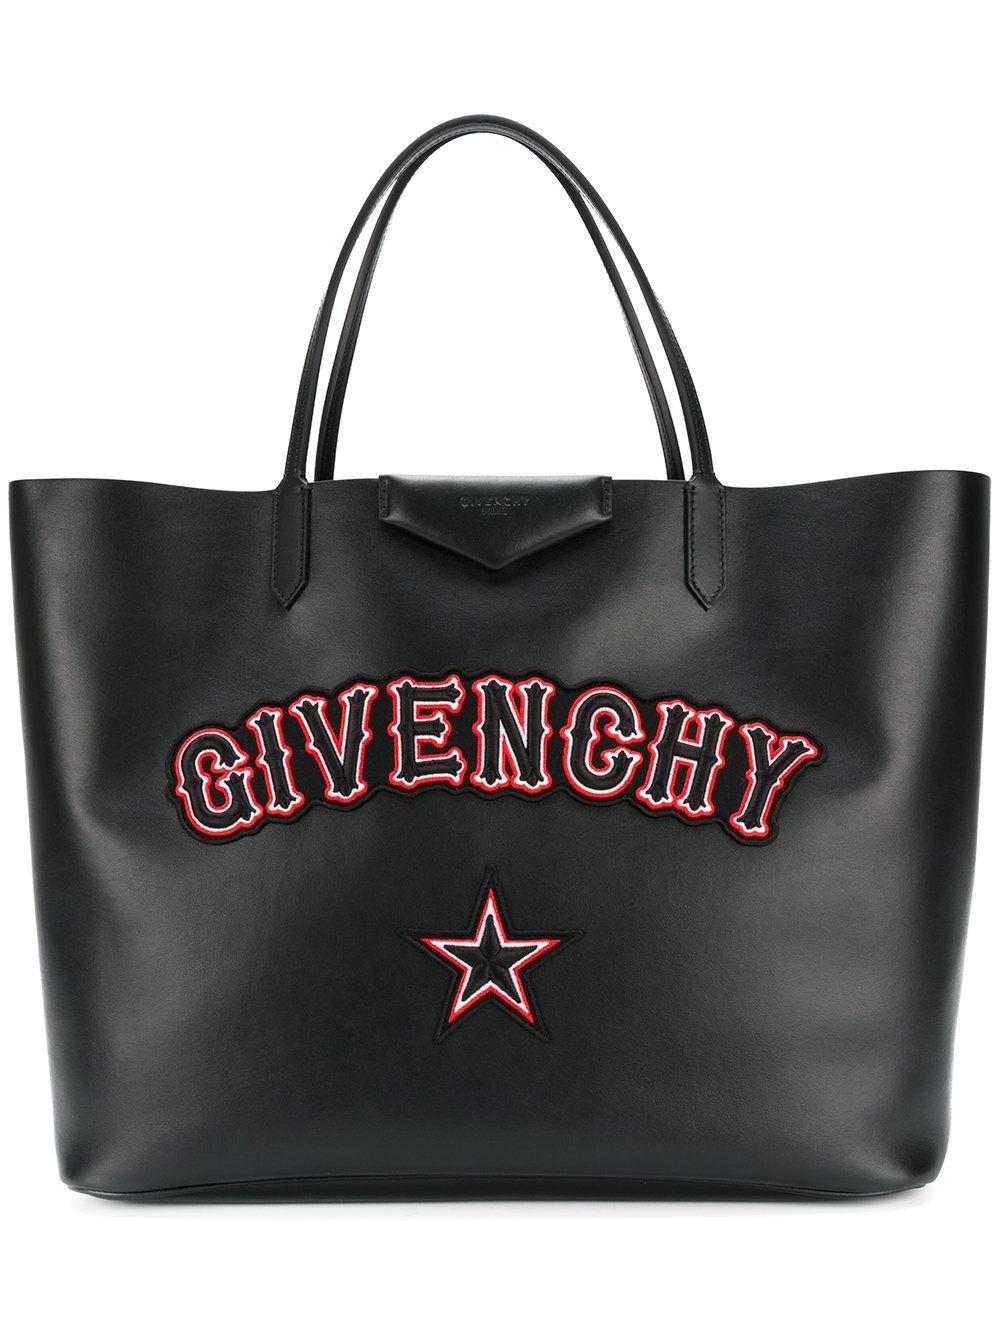 92fd8e48345a  givenchy  new  antigona  tote  bag  logo  style  fashion  star www.jofre.eu